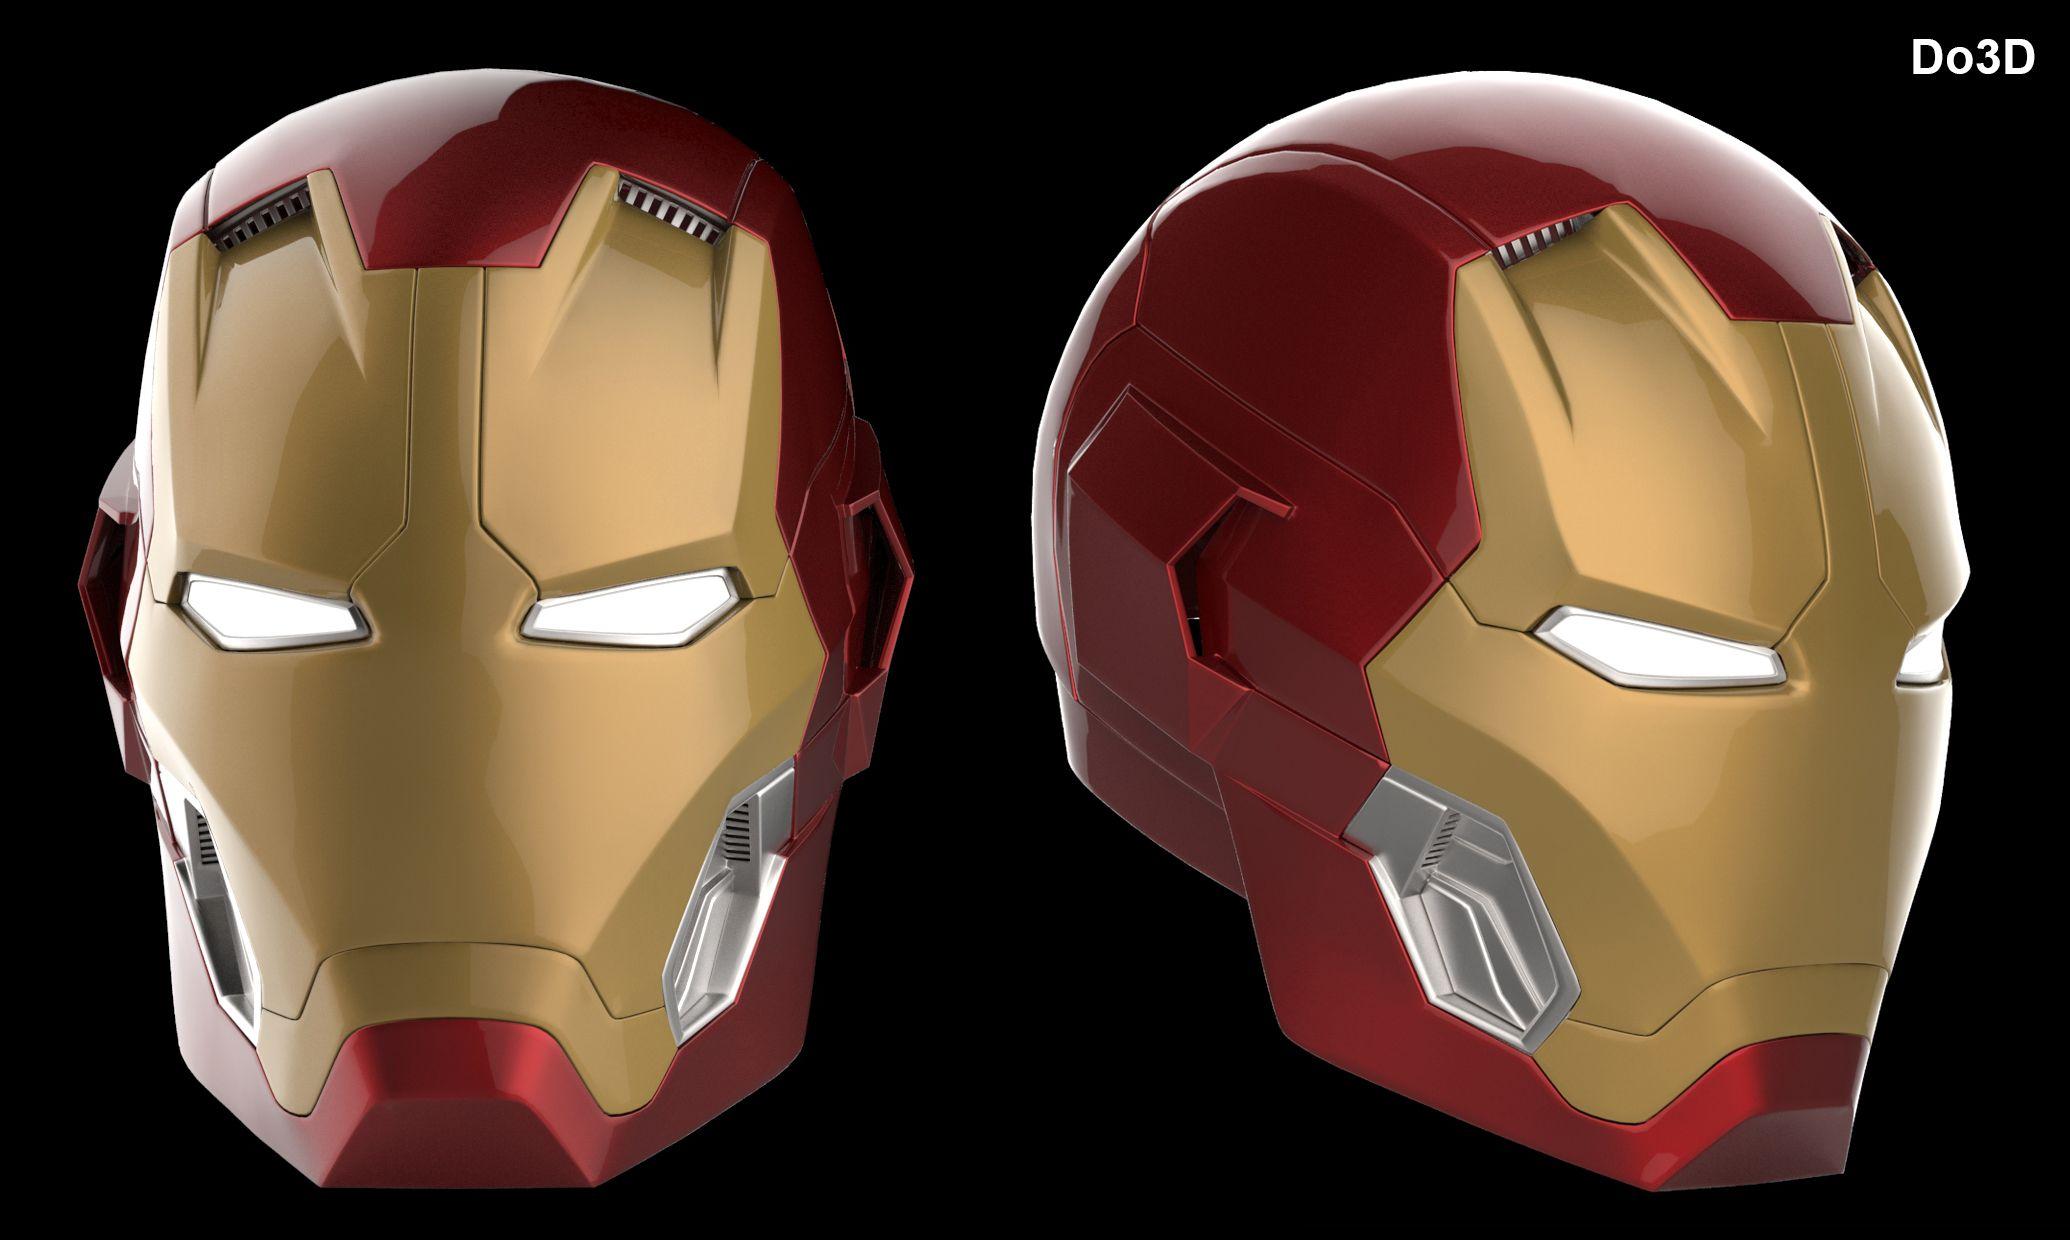 Iron Man Da Stampare: 3D Printable: Iron Man Mark XLV Helmet (Model: MK 45) From